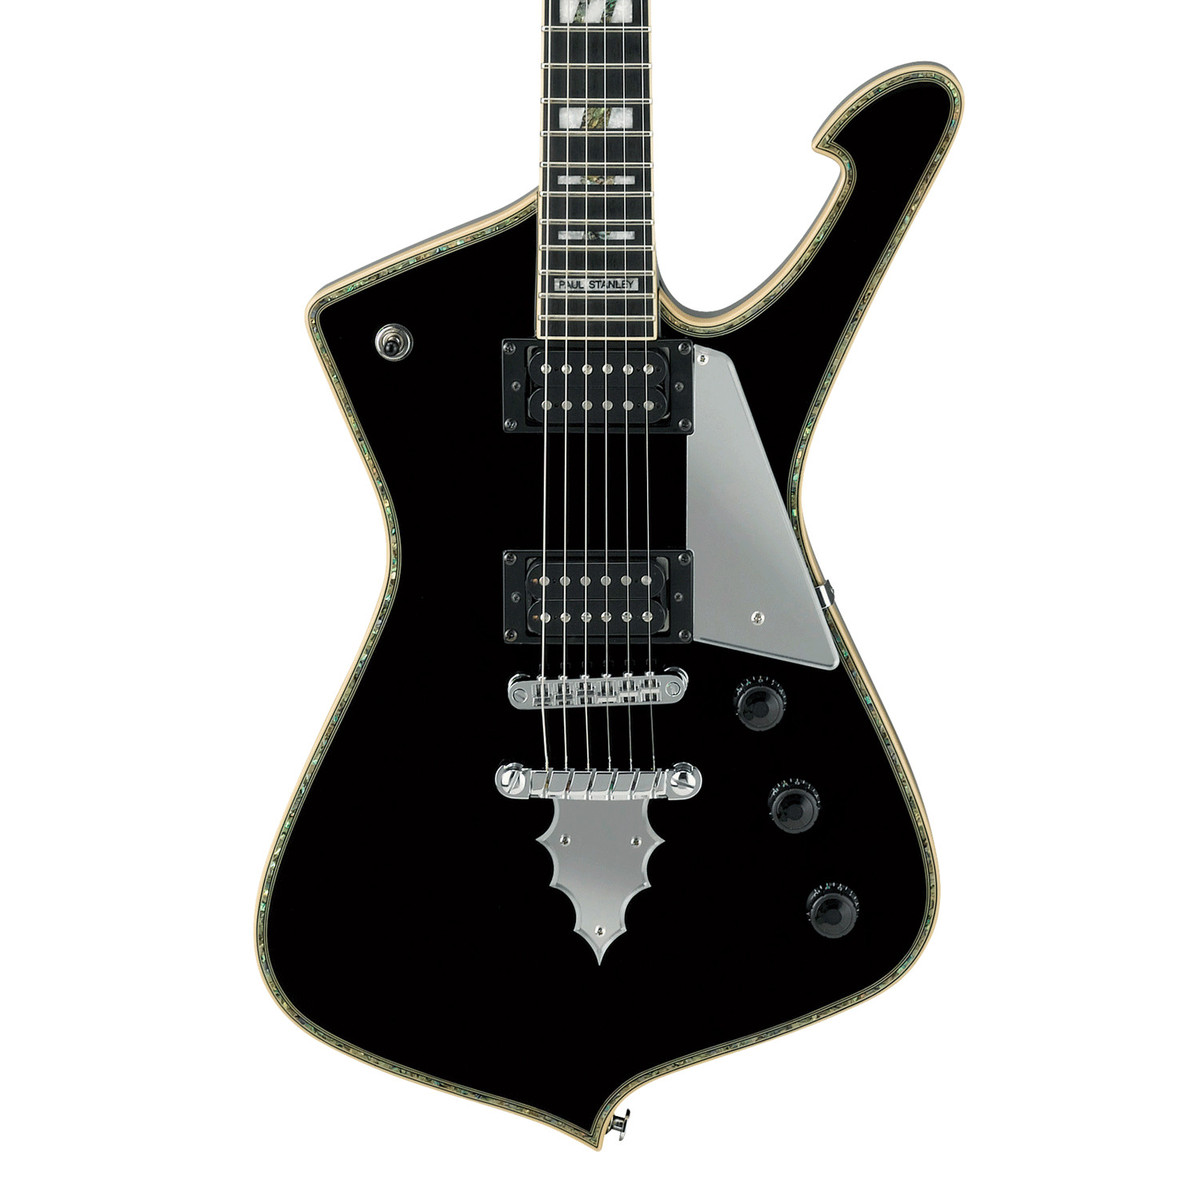 ibanez paul stanley ps120 bk signature electric guitar black ex demo at gear4music. Black Bedroom Furniture Sets. Home Design Ideas